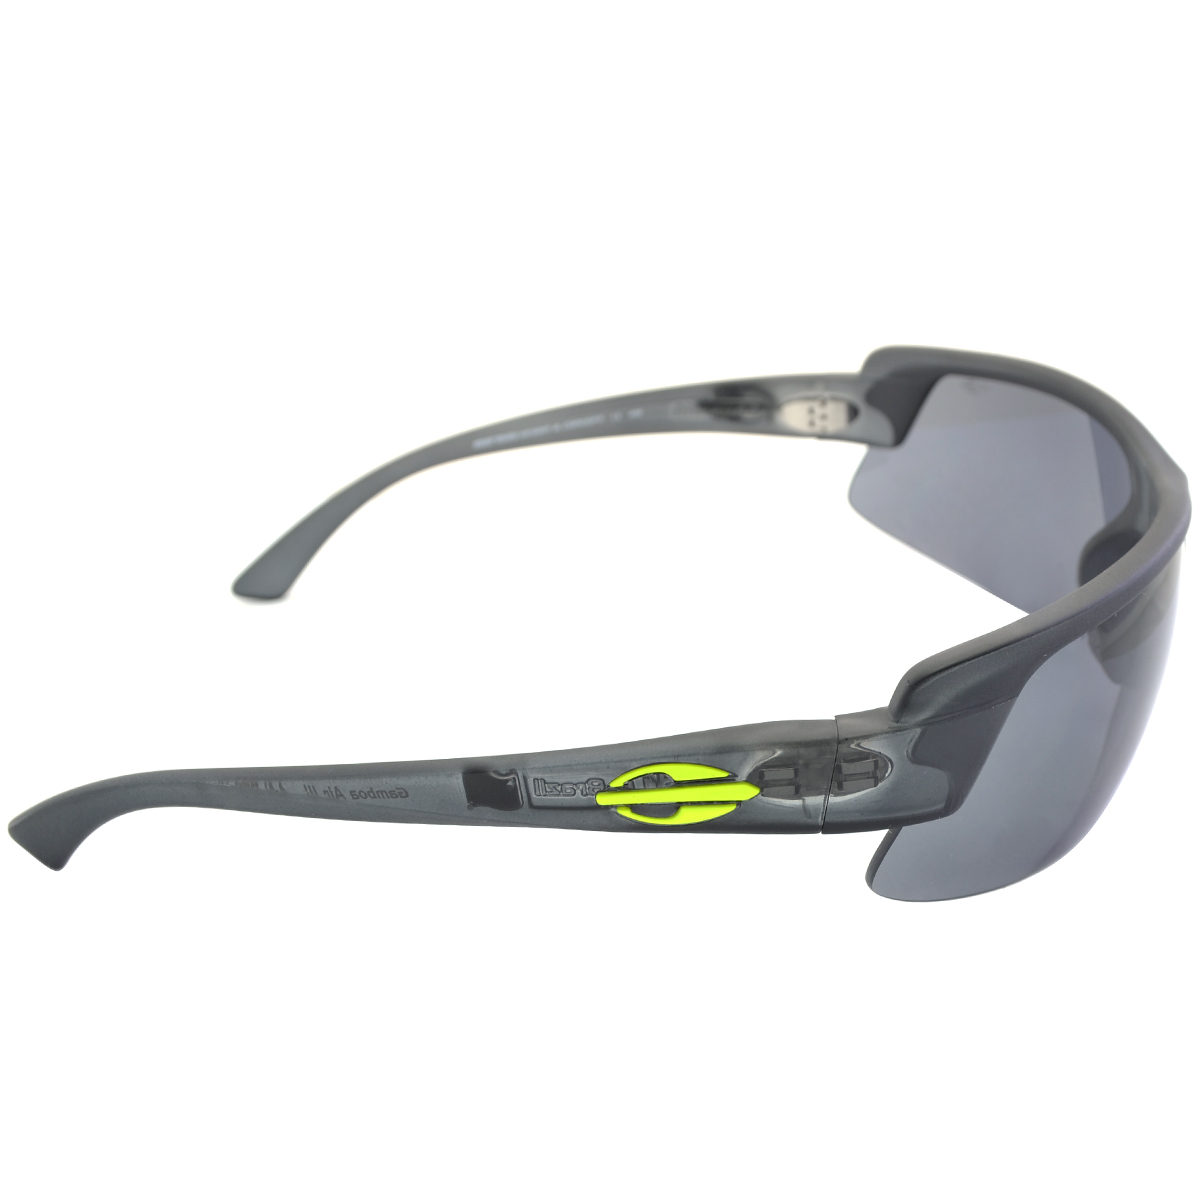 Óculos Mormaii Gamboa Air 3 Fume Fosco  Lente Cinza ref 44187301 a14f23bc3c